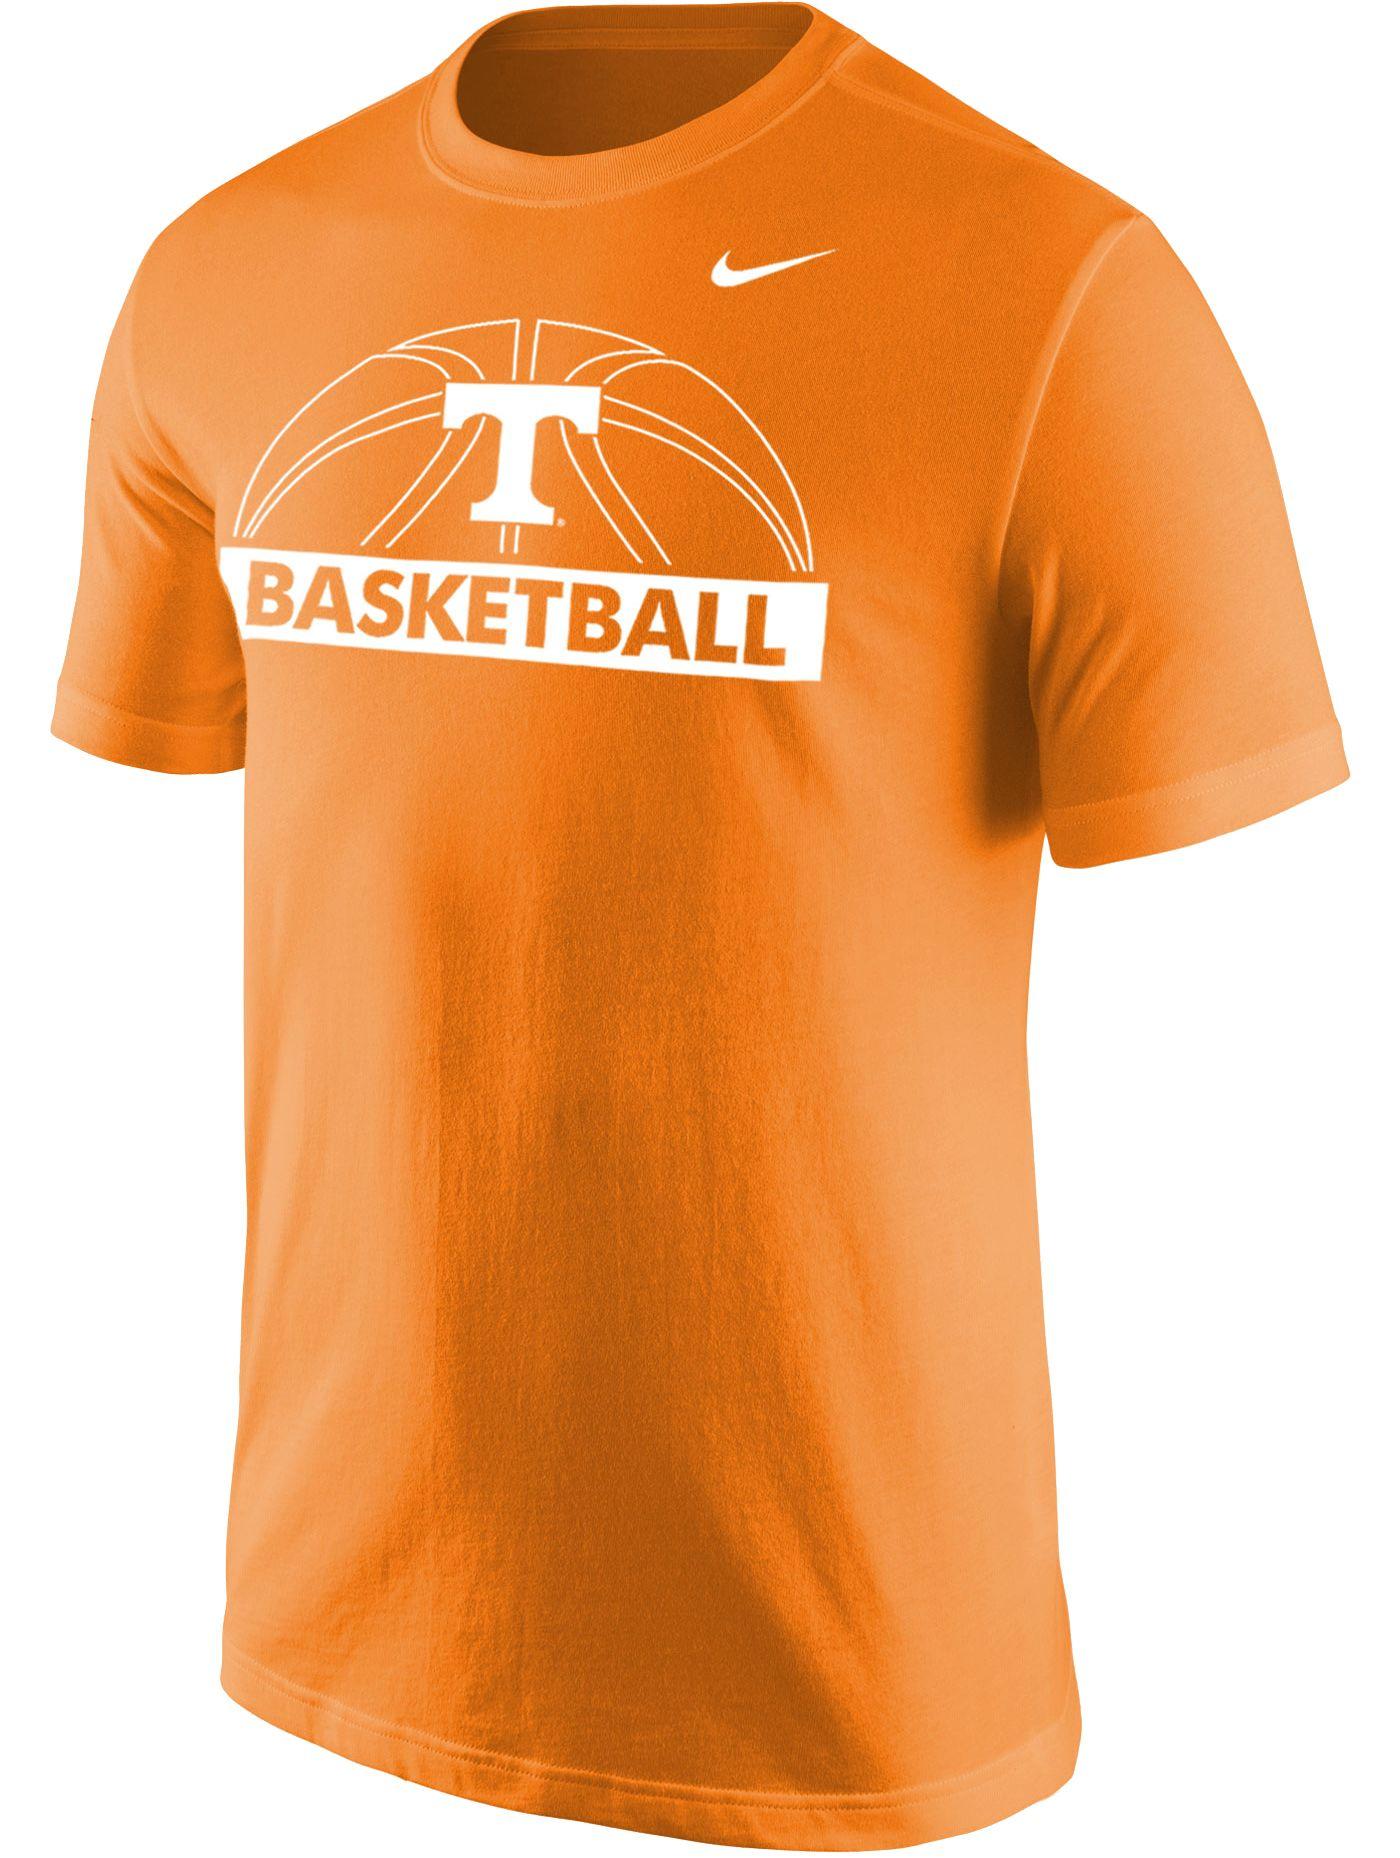 Nike Men's Tennessee Volunteers Tennessee Orange Dri-FIT Cotton Basketball T-Shirt